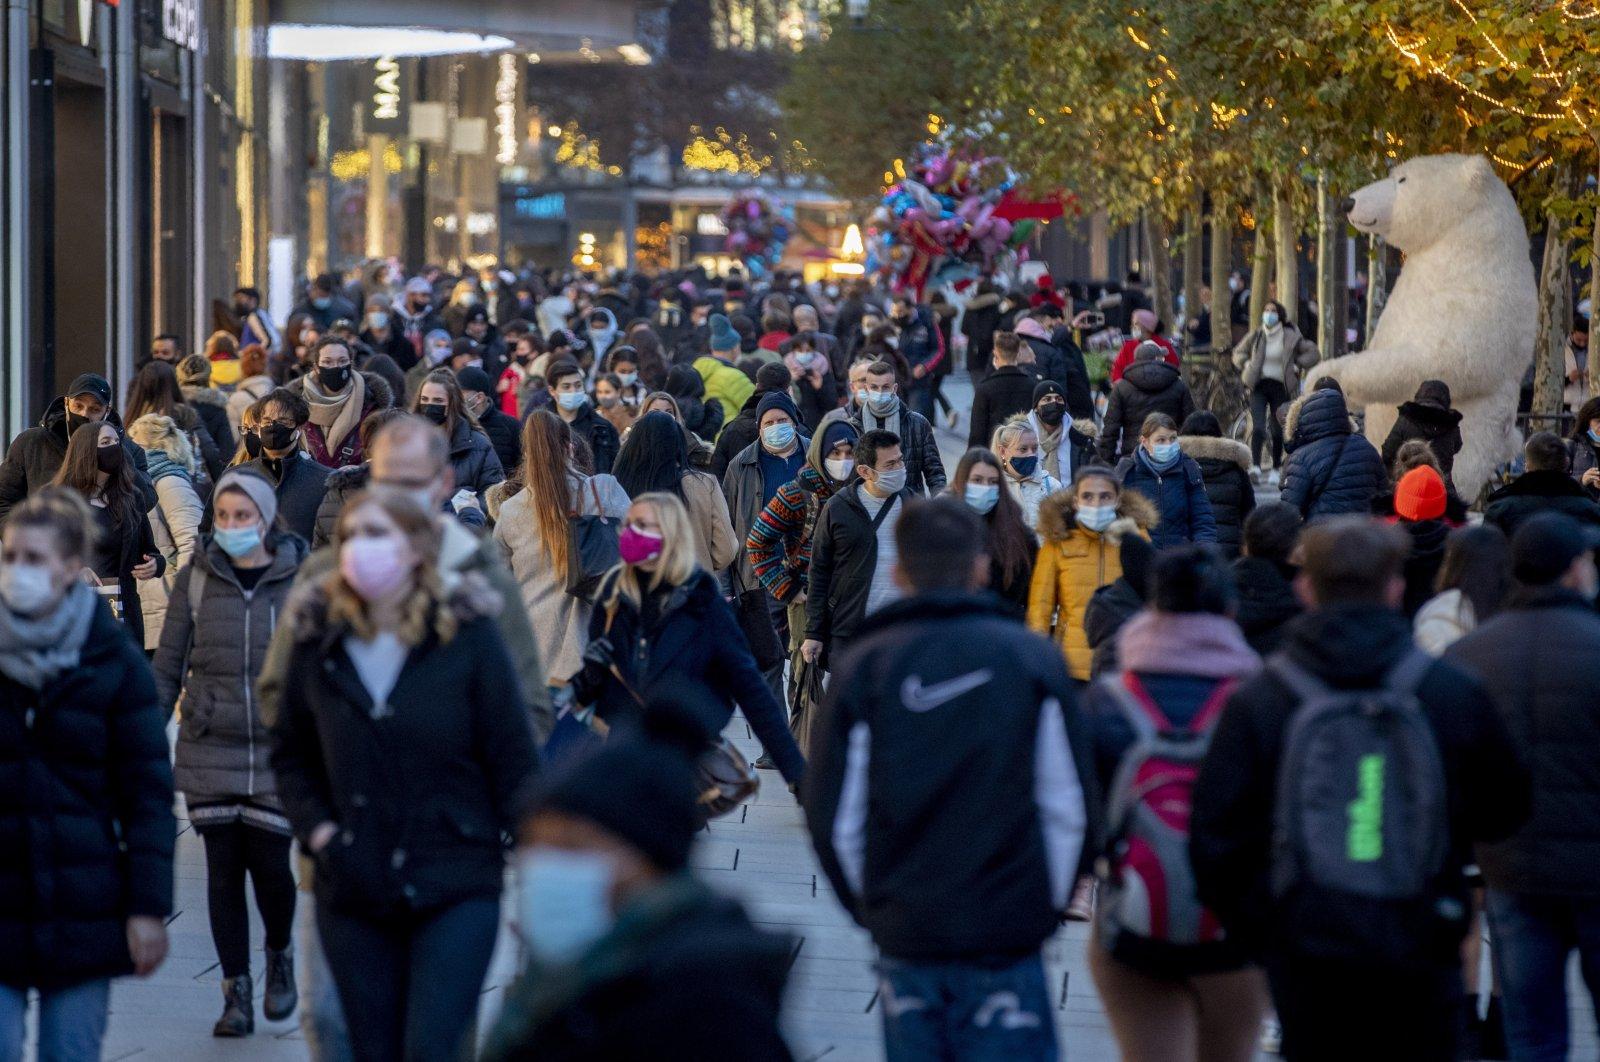 People walk in the main pedestrian zone in Frankfurt, Germany, Dec. 14, 2020. (AP Photo)